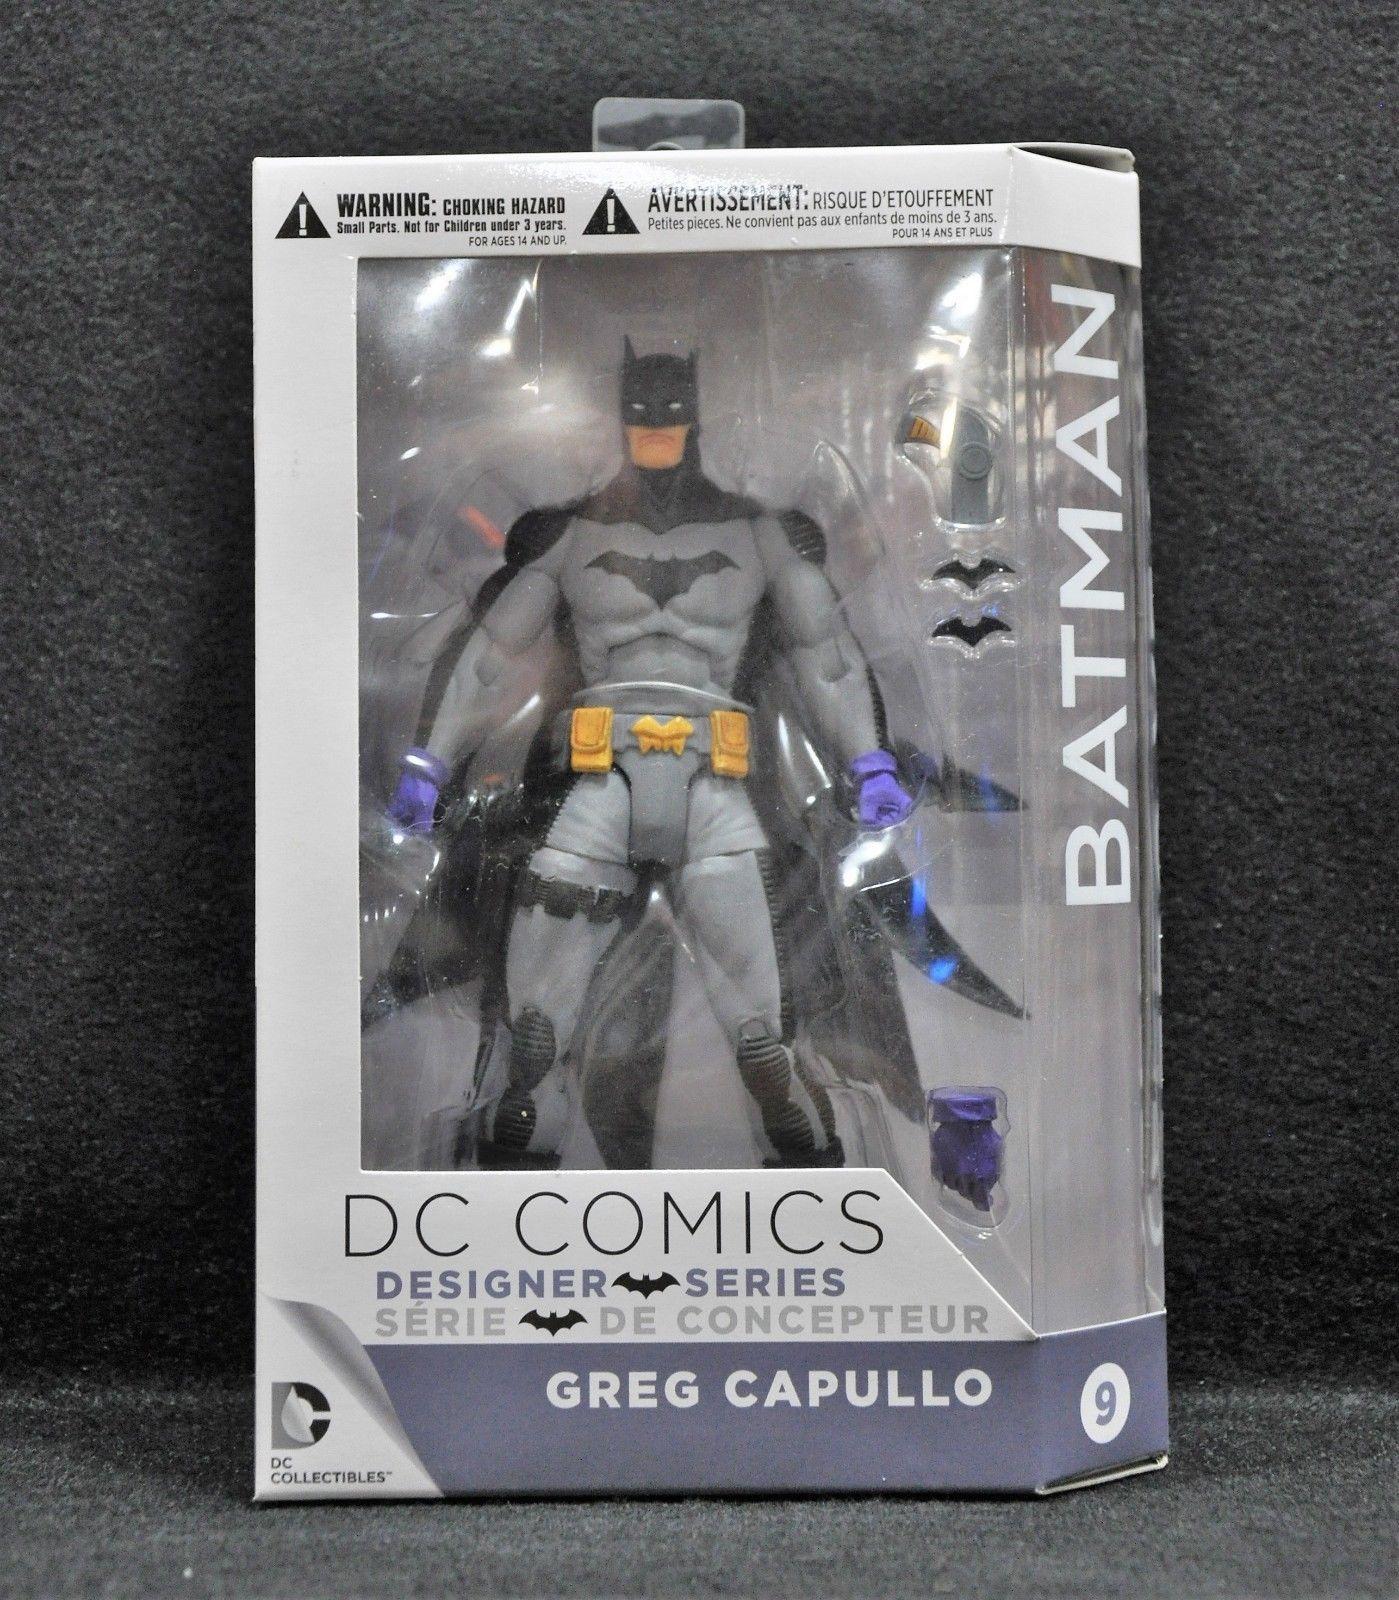 DC Comics Designer Action Figures Series 3: Zero Year Batman by Greg Capullo Act